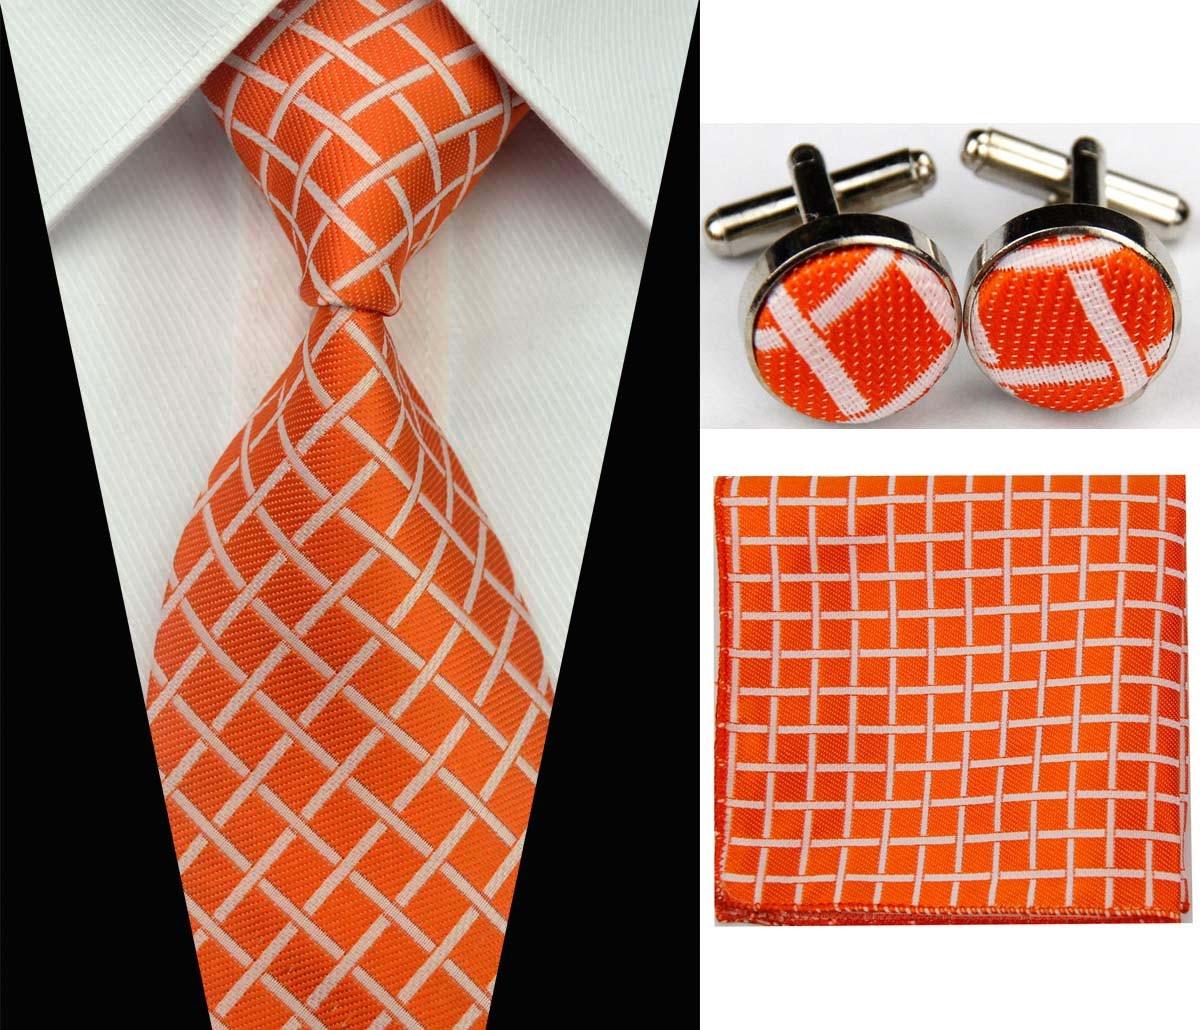 2195 New JACQUARD WOVEN Silk Men/'s Tie Necktie